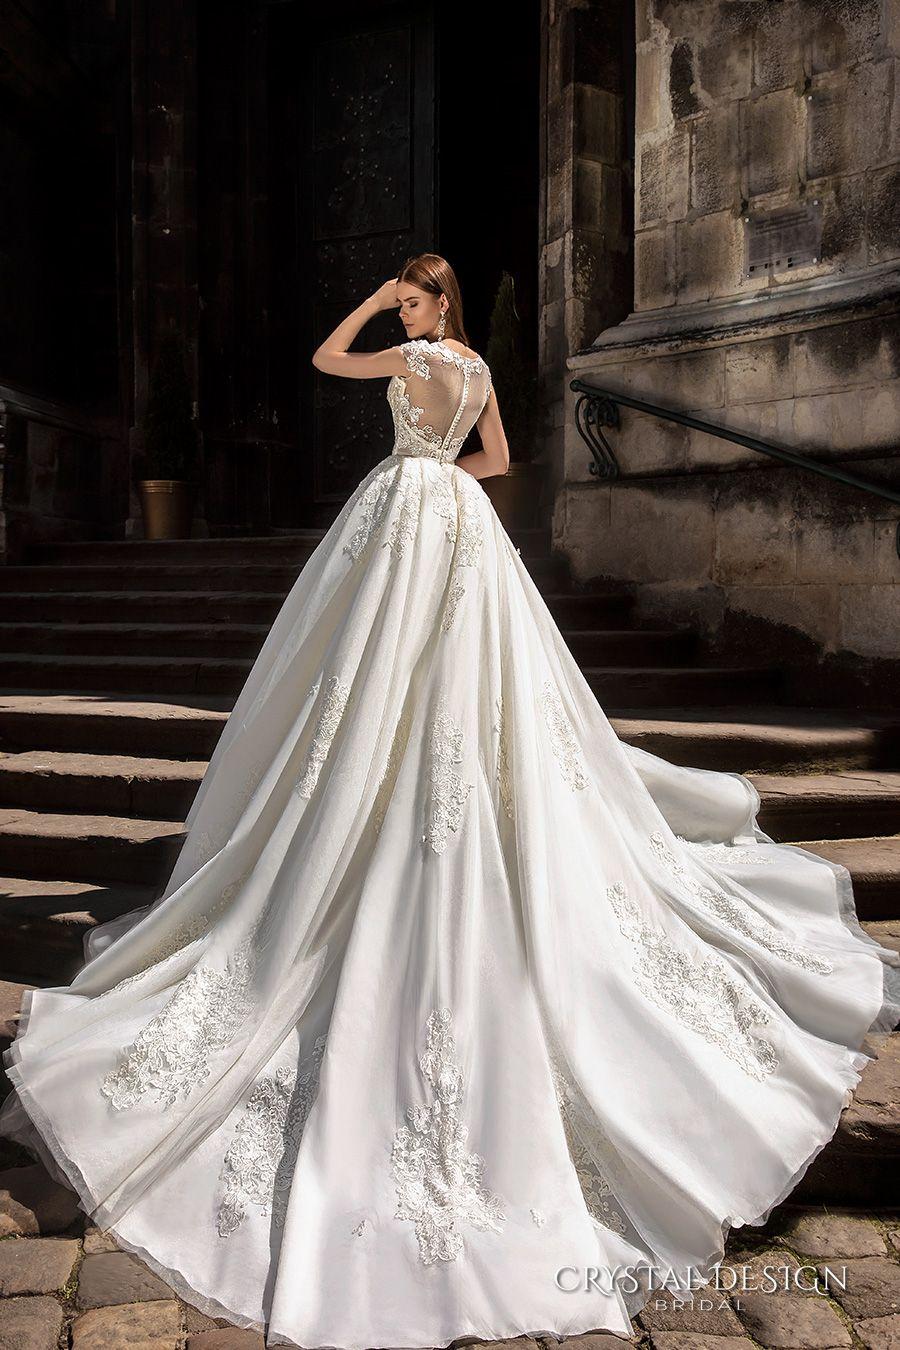 Vestidos de Noiva 2018 vestidos de casamento de luxo com mangas tampadas frisado Lace Appliqued Catedral Train vestidos de noiva Custom Made